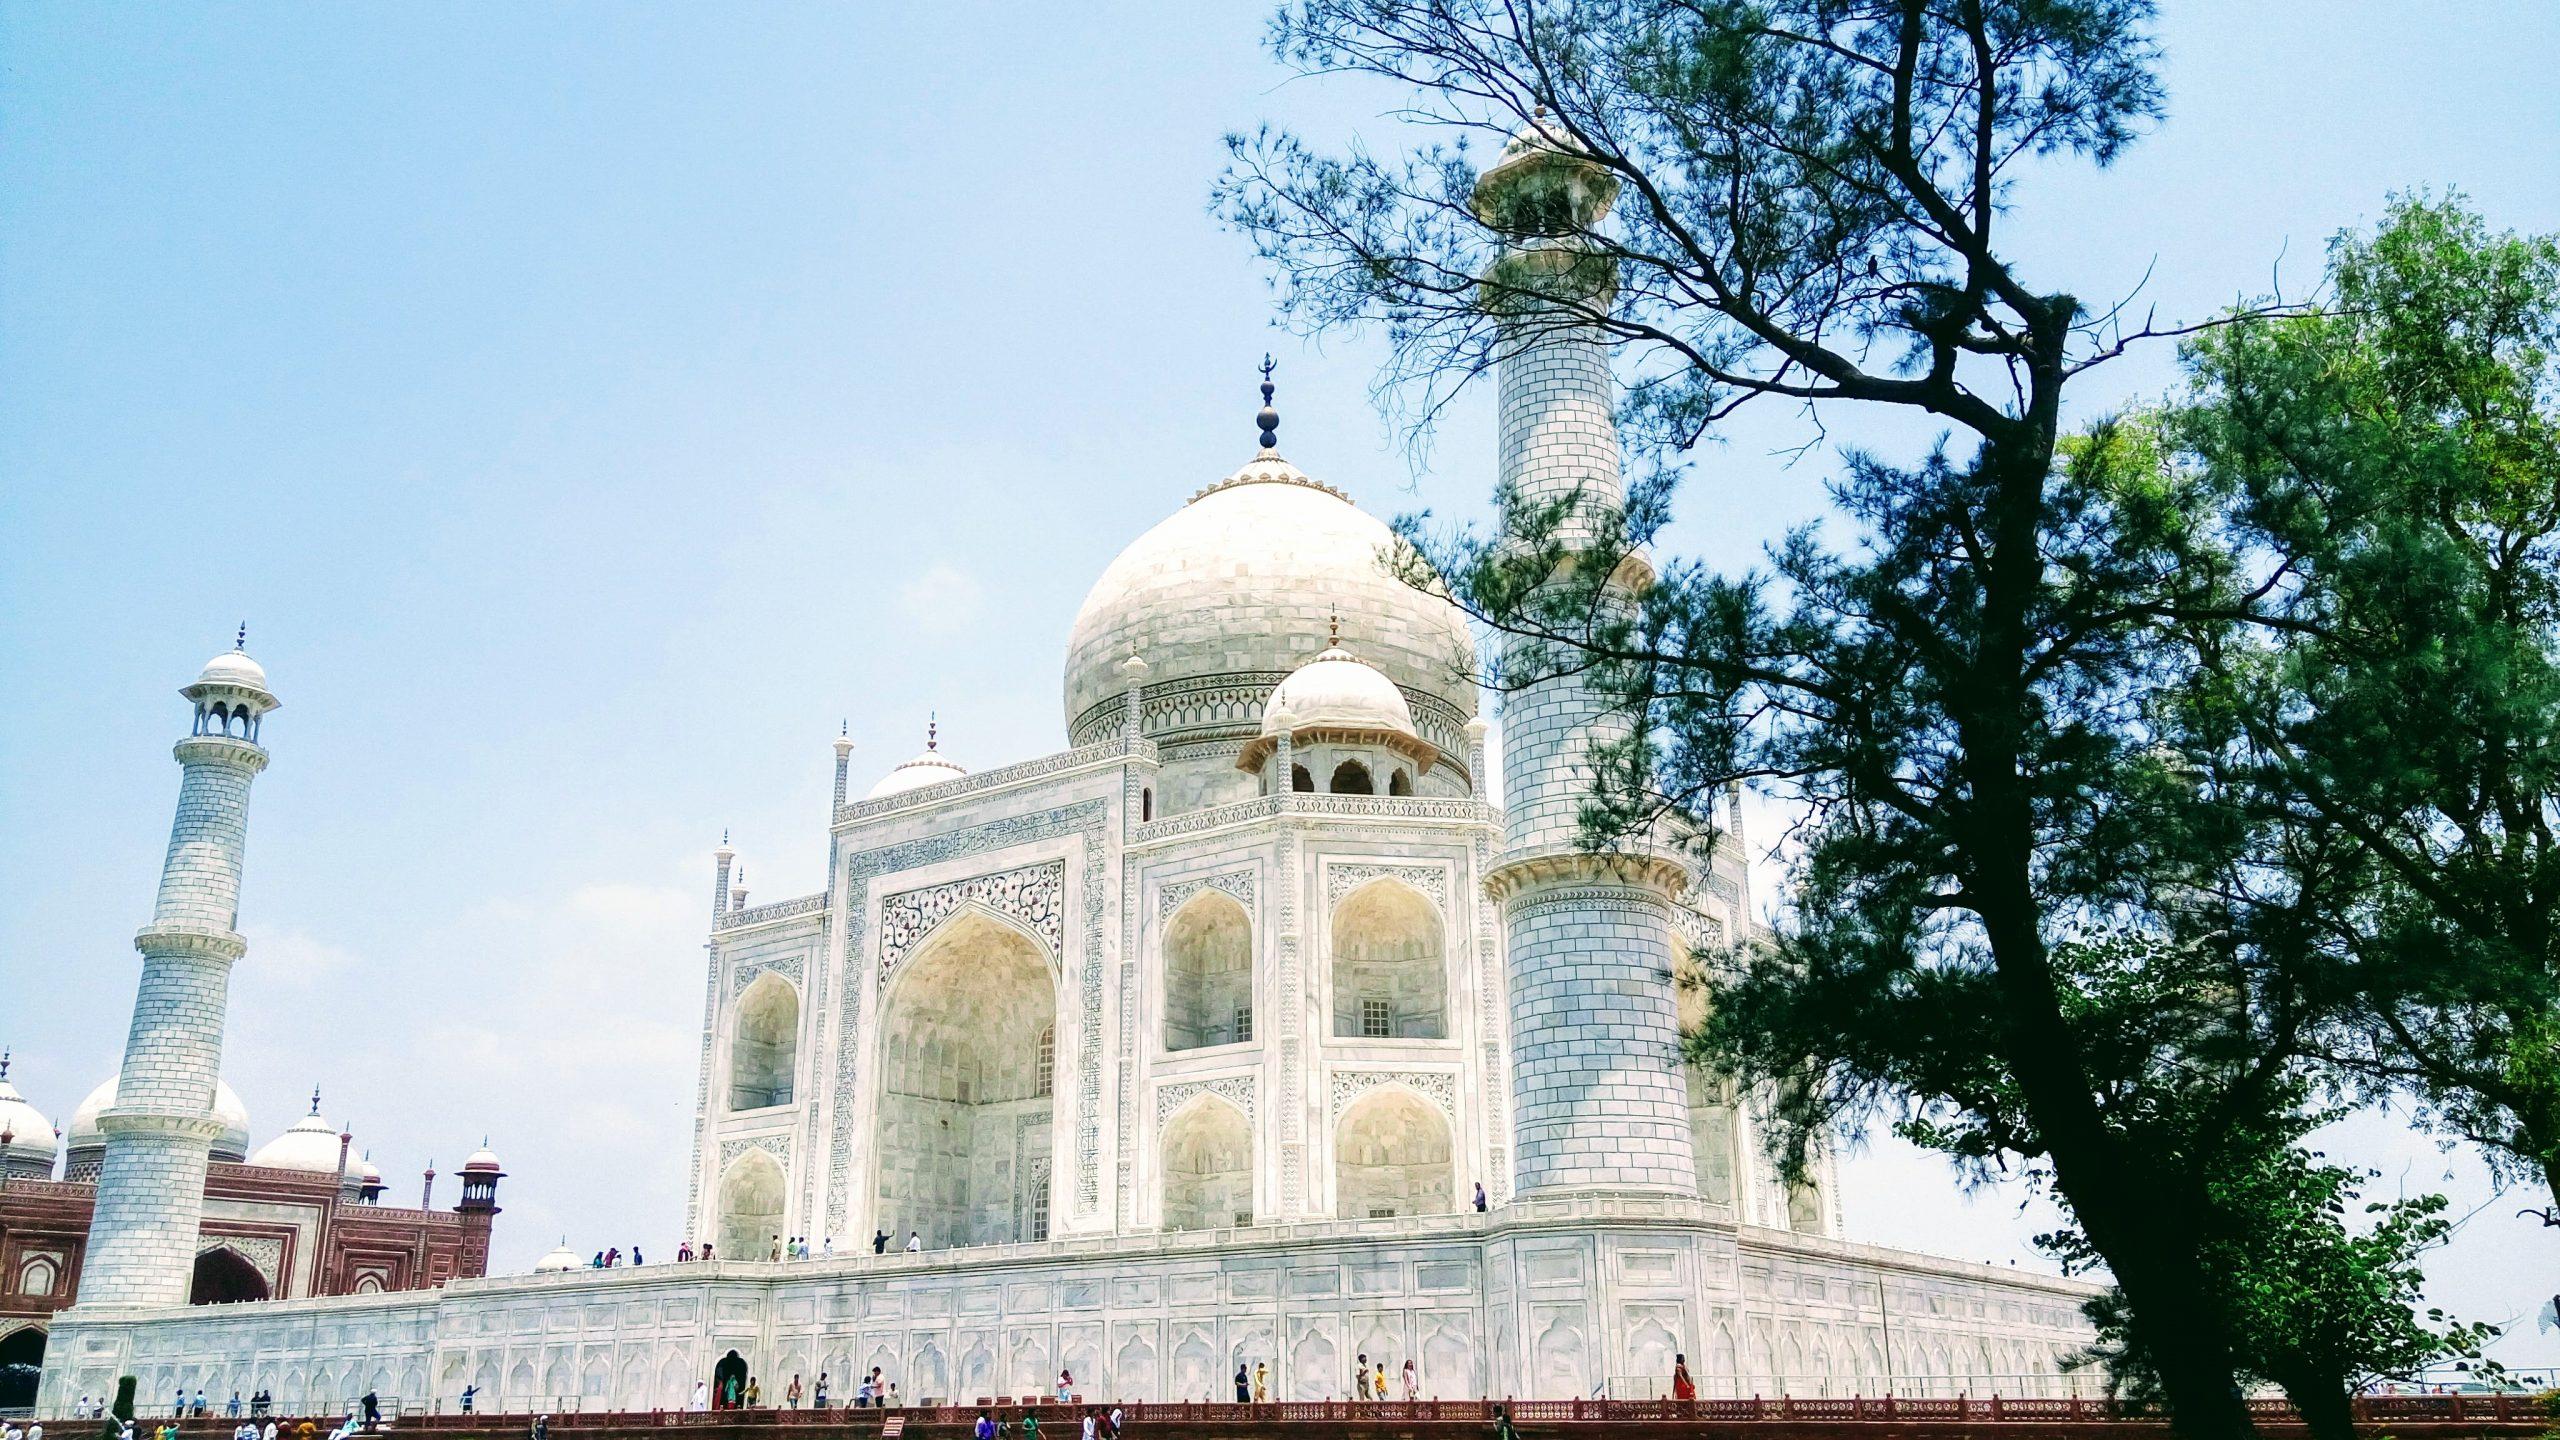 Taj Mahal - Seventh wonder of the world.